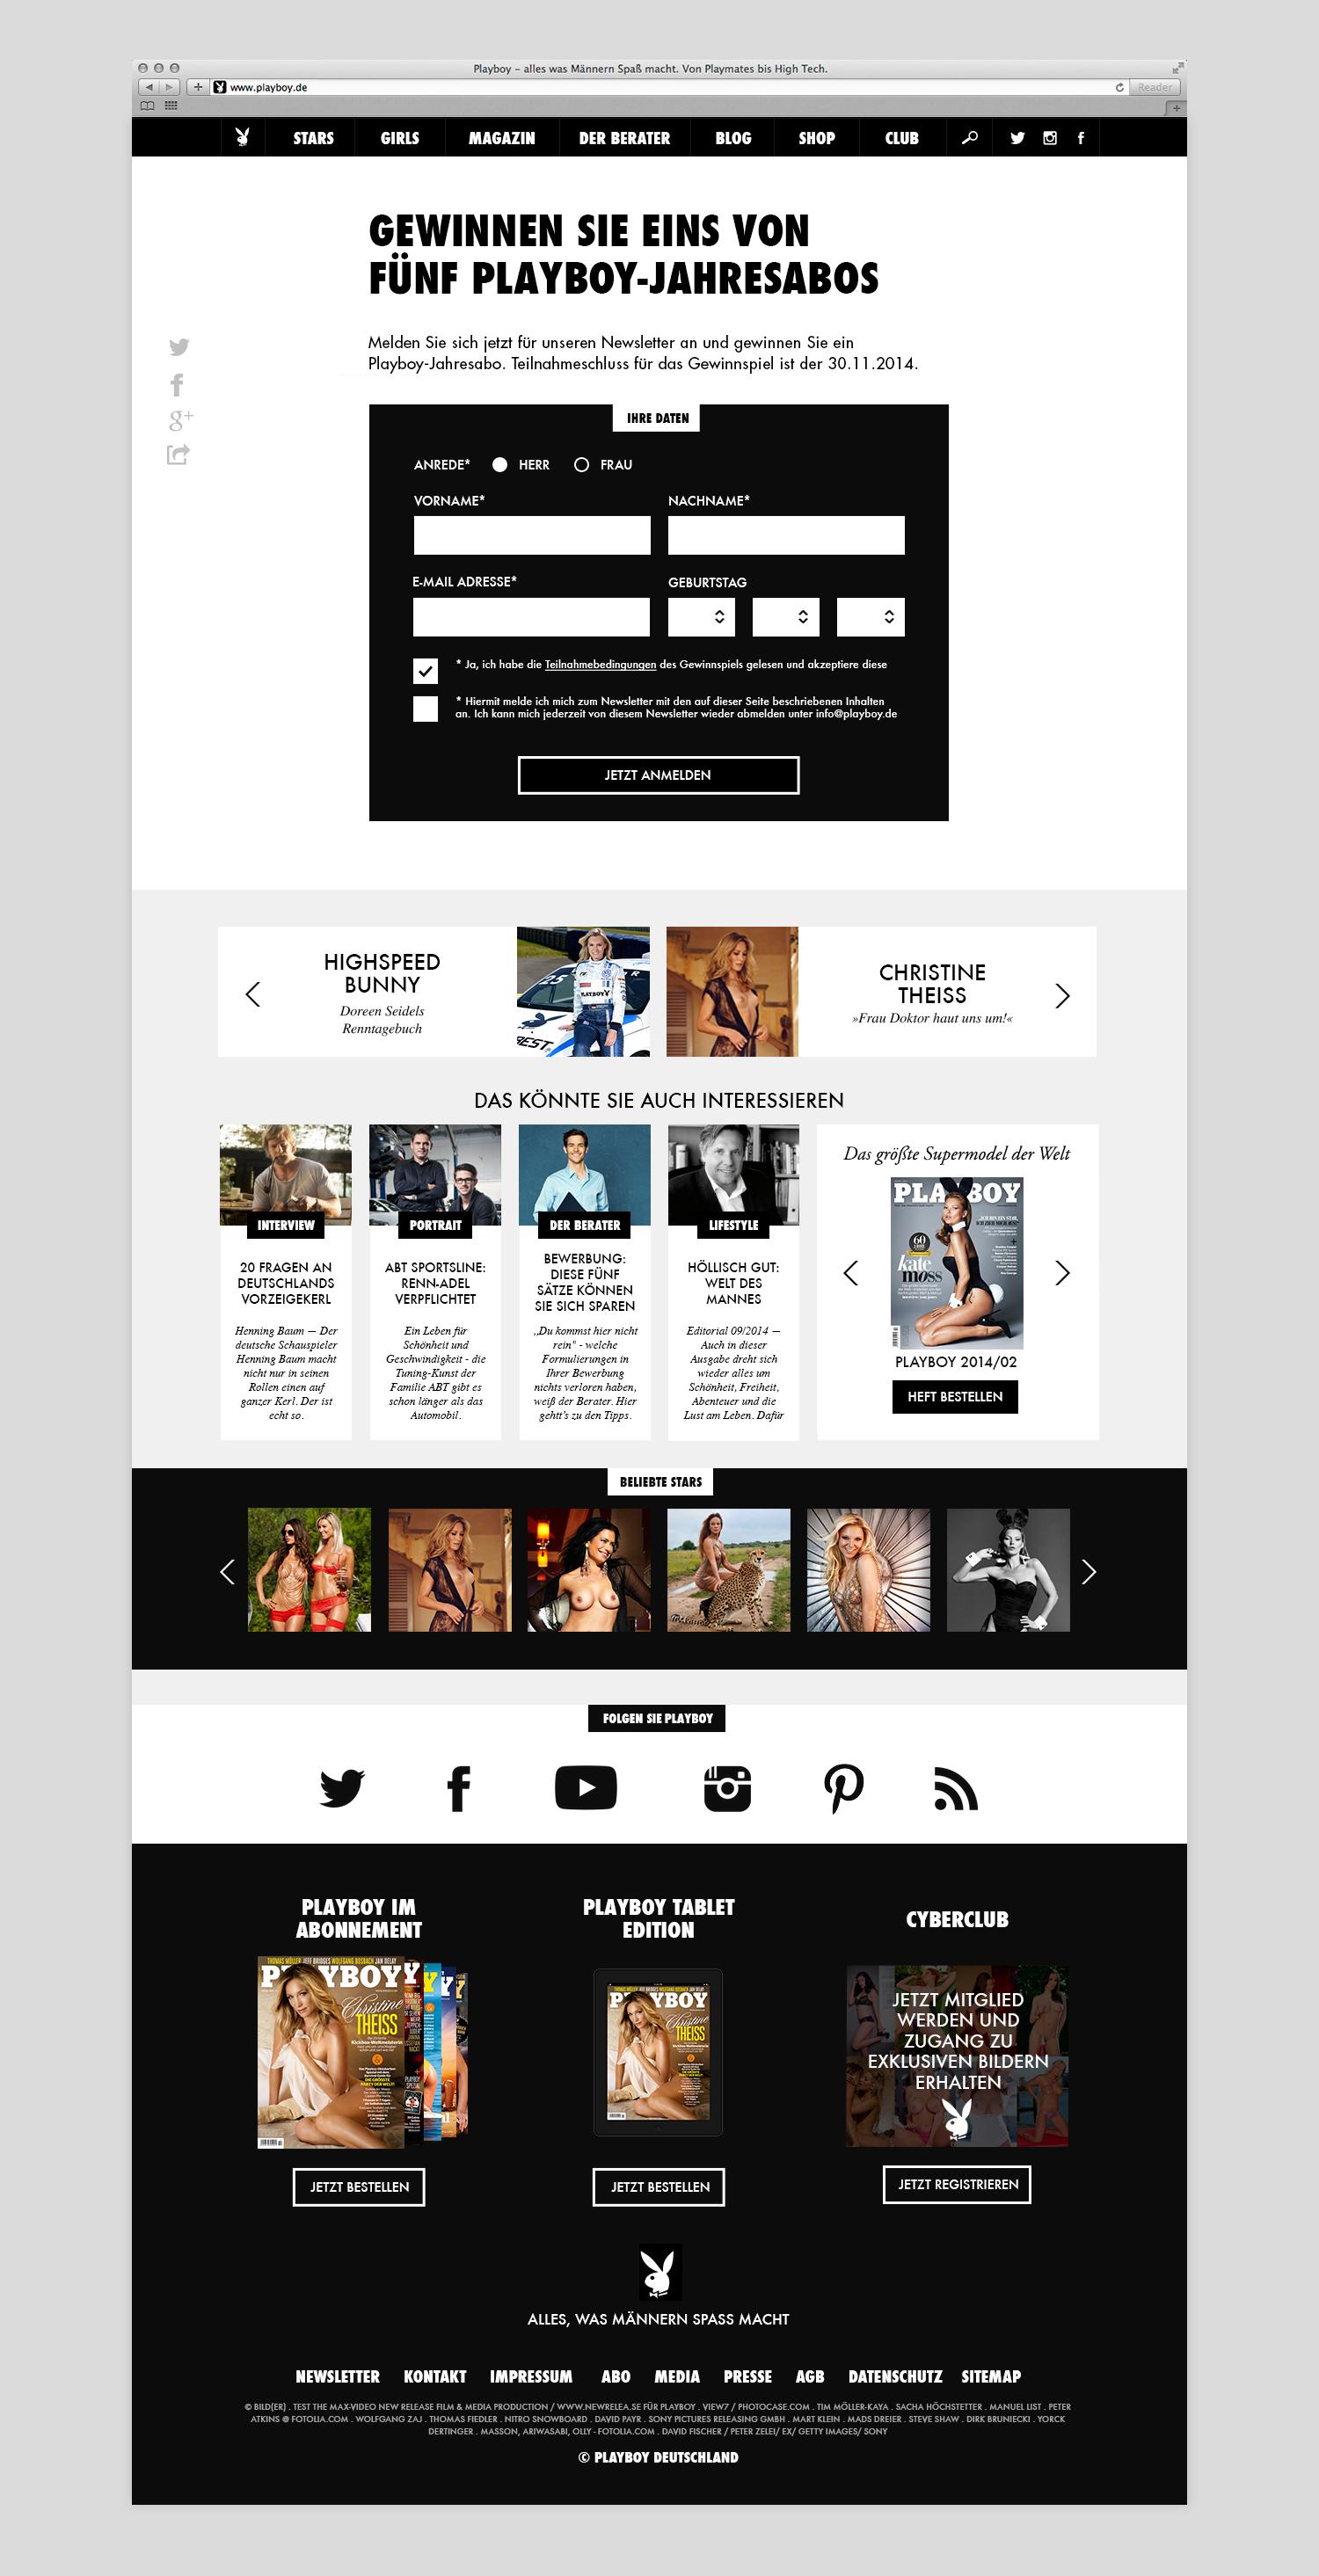 Playboy_Desktop_Formular_Portfolio_Schatten2